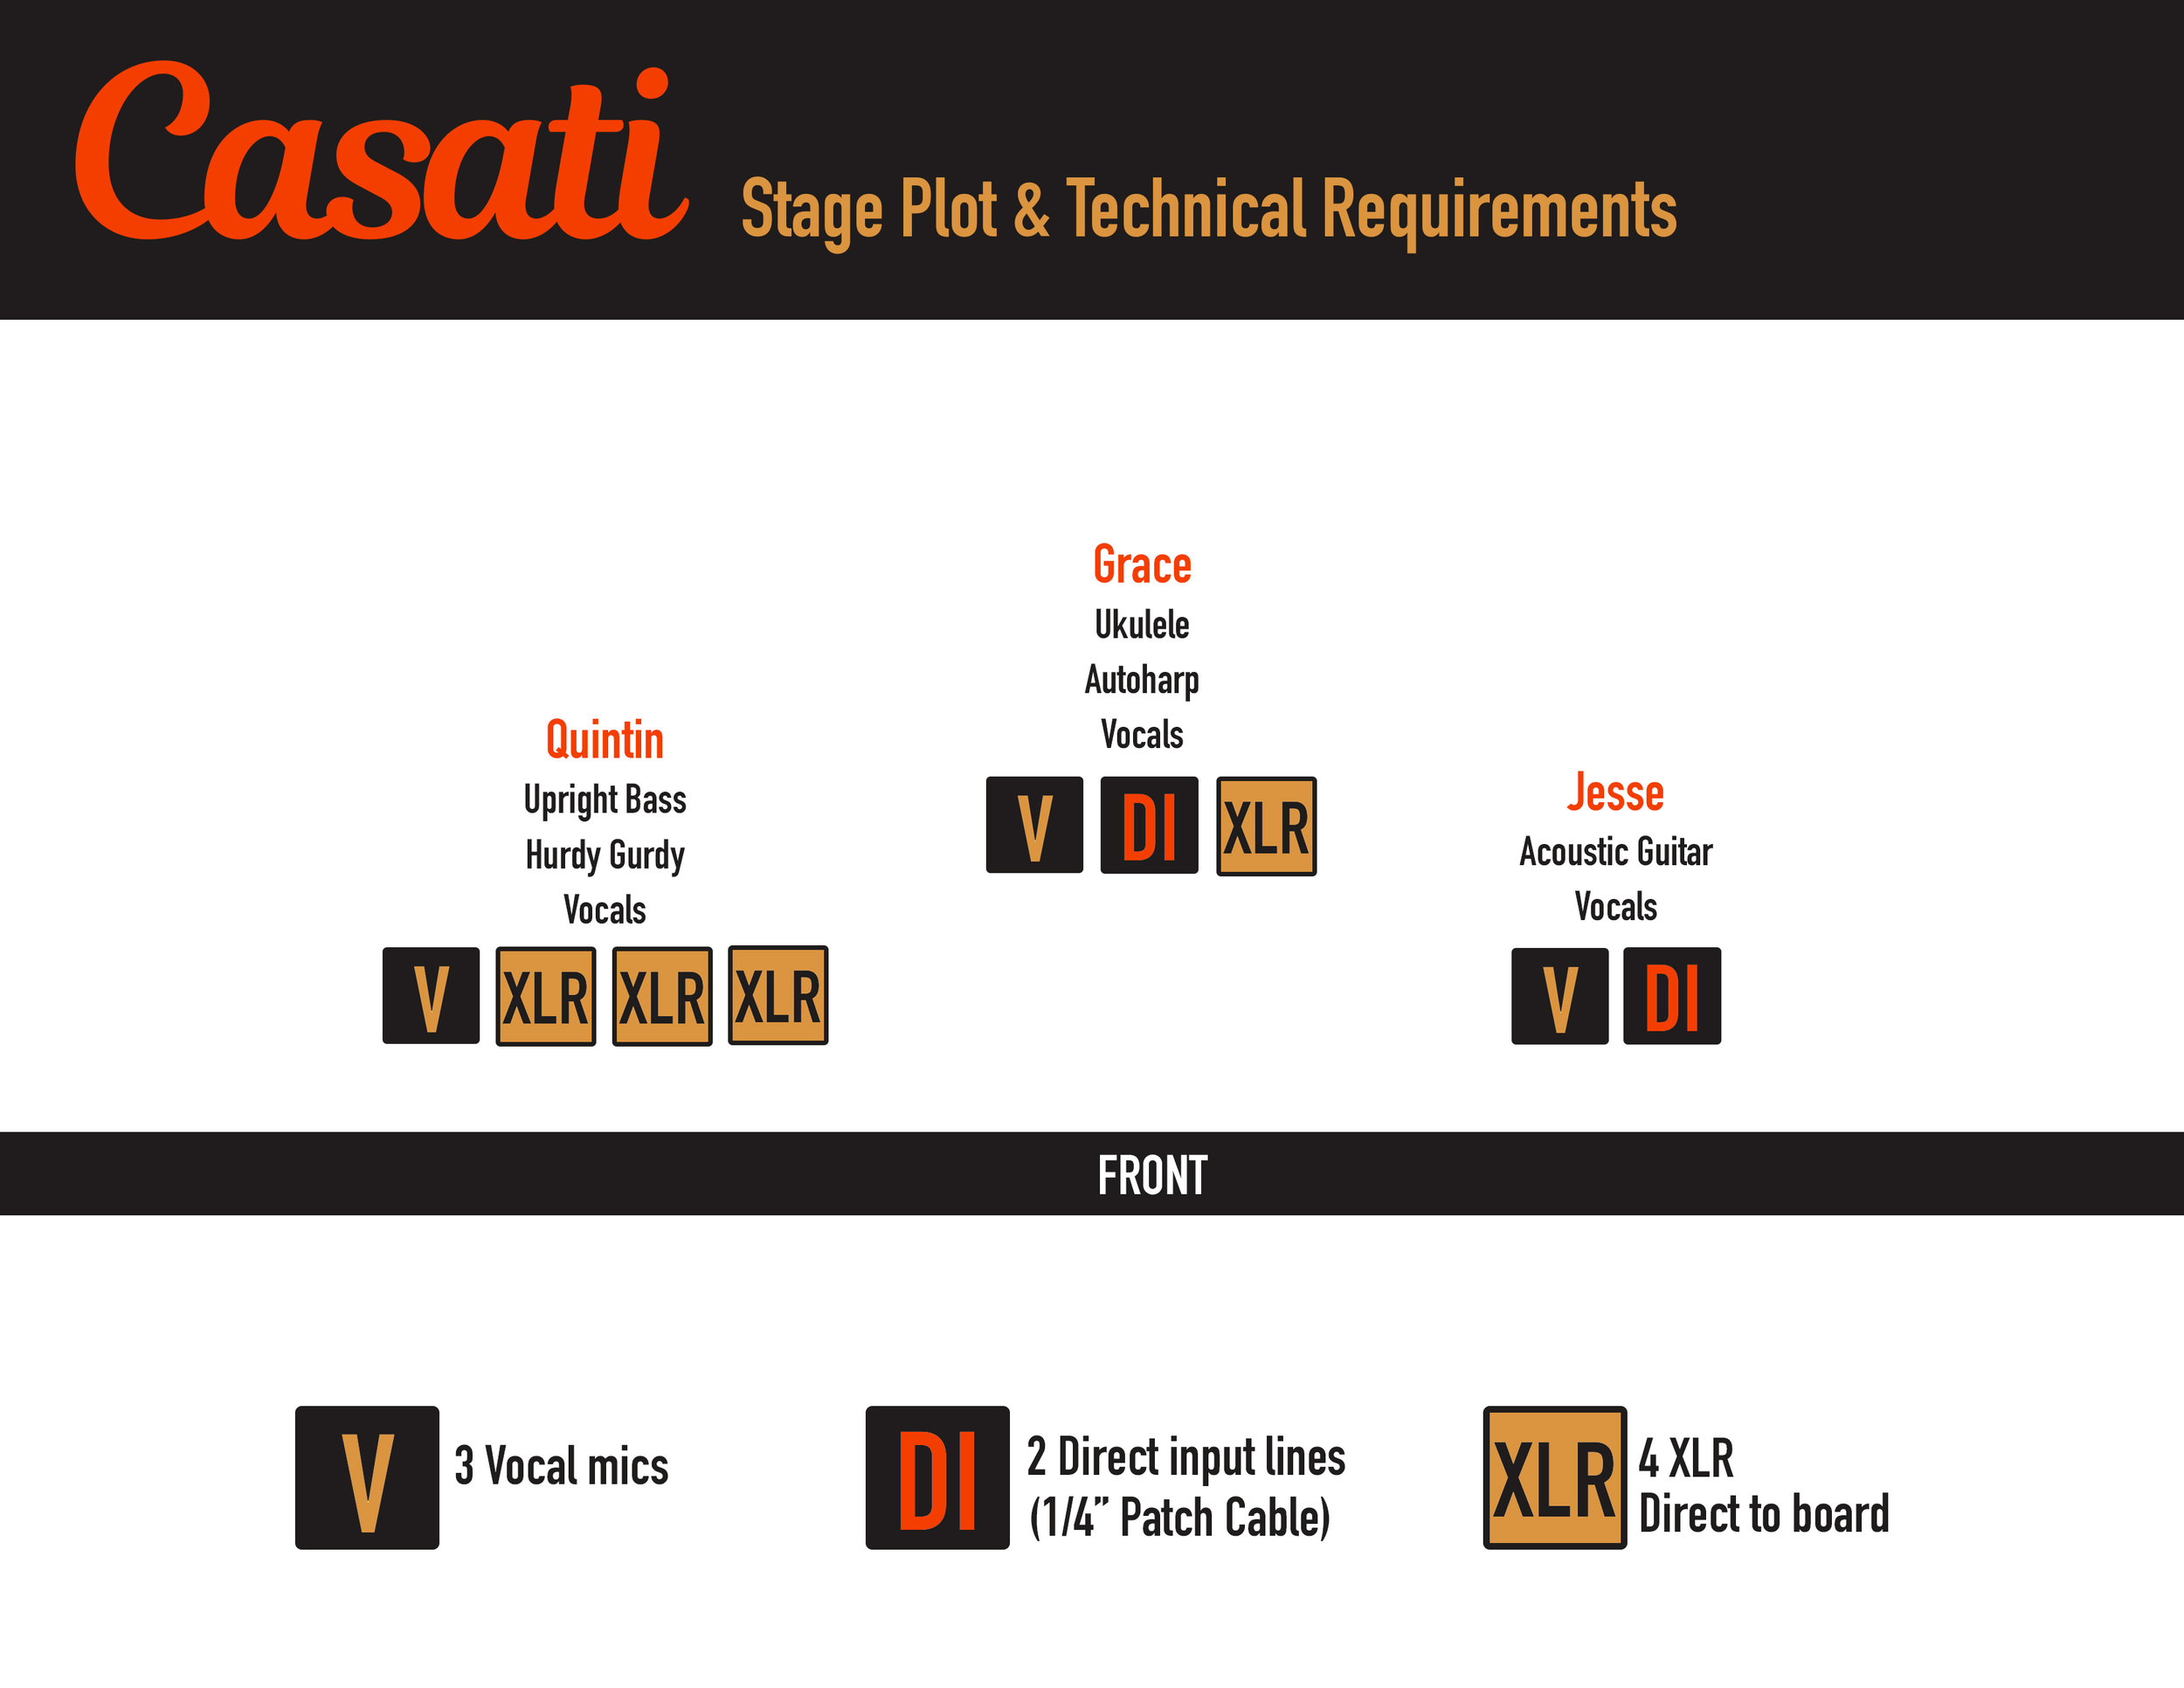 2019 Casati Technical Stage Plot.jpg